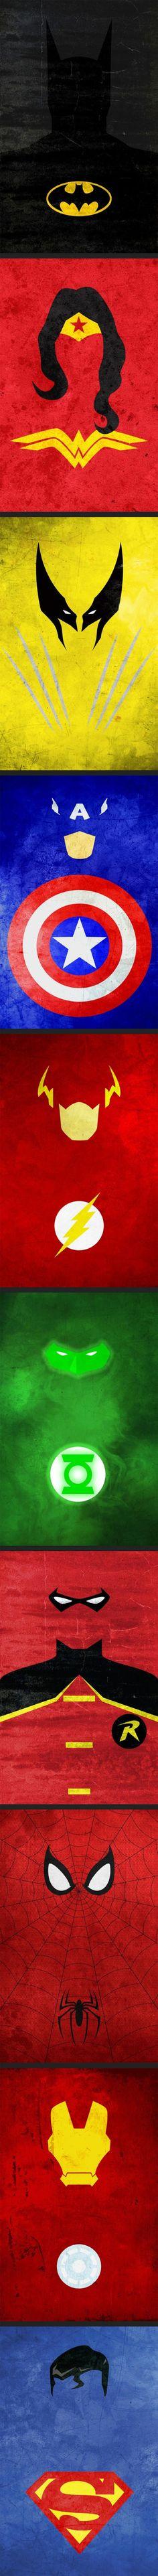 Minimaliste super hero